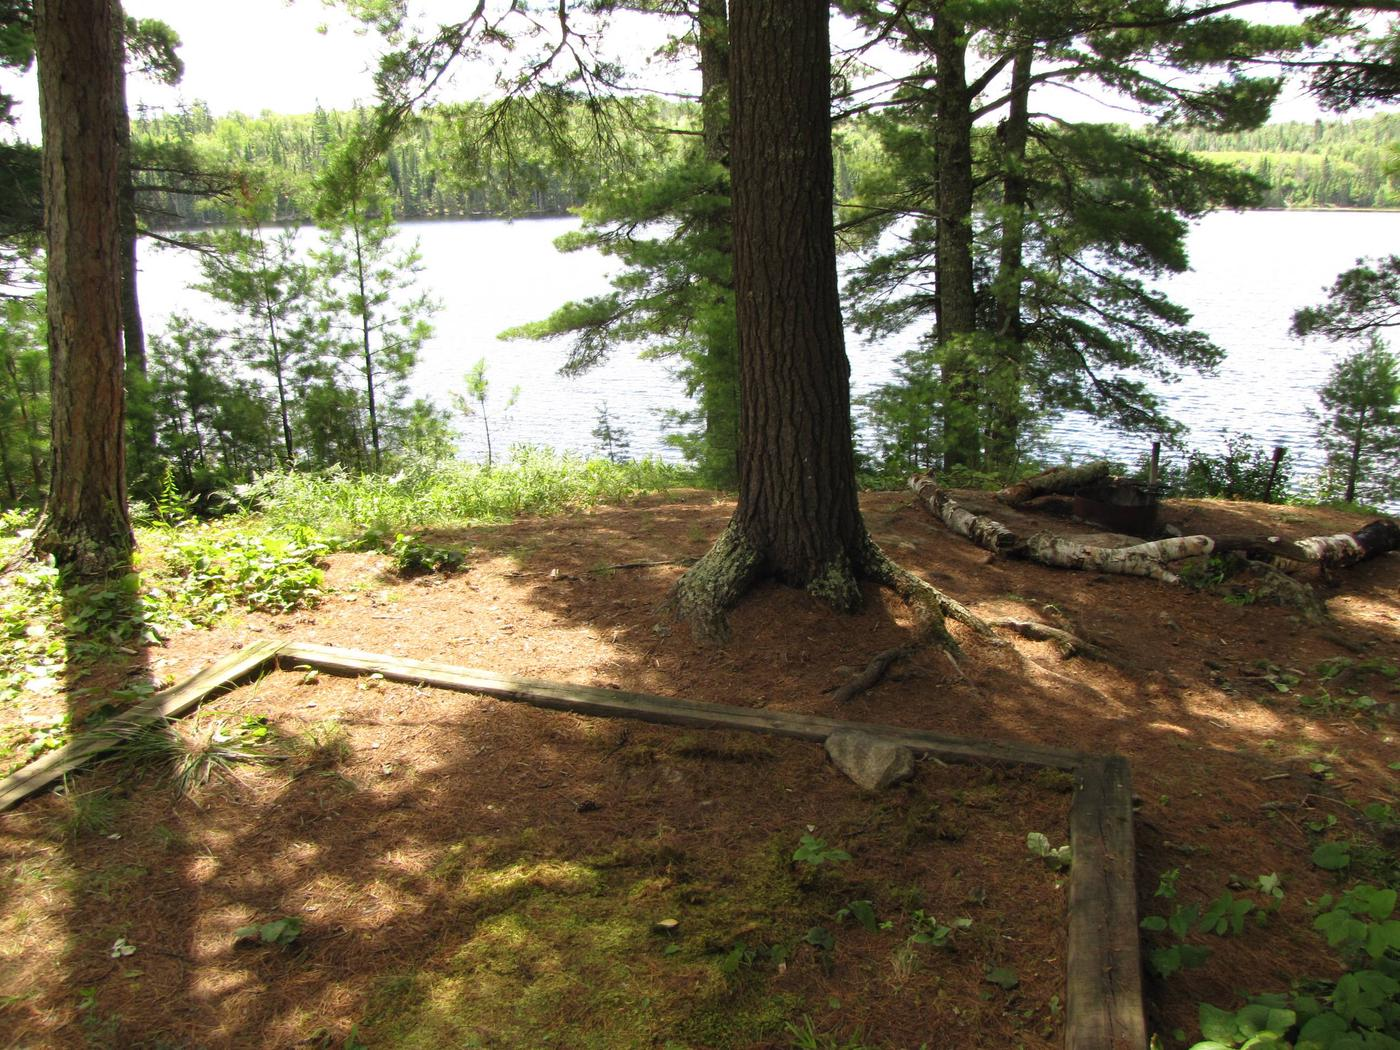 B11 - Loiten Lake backcountry campsite